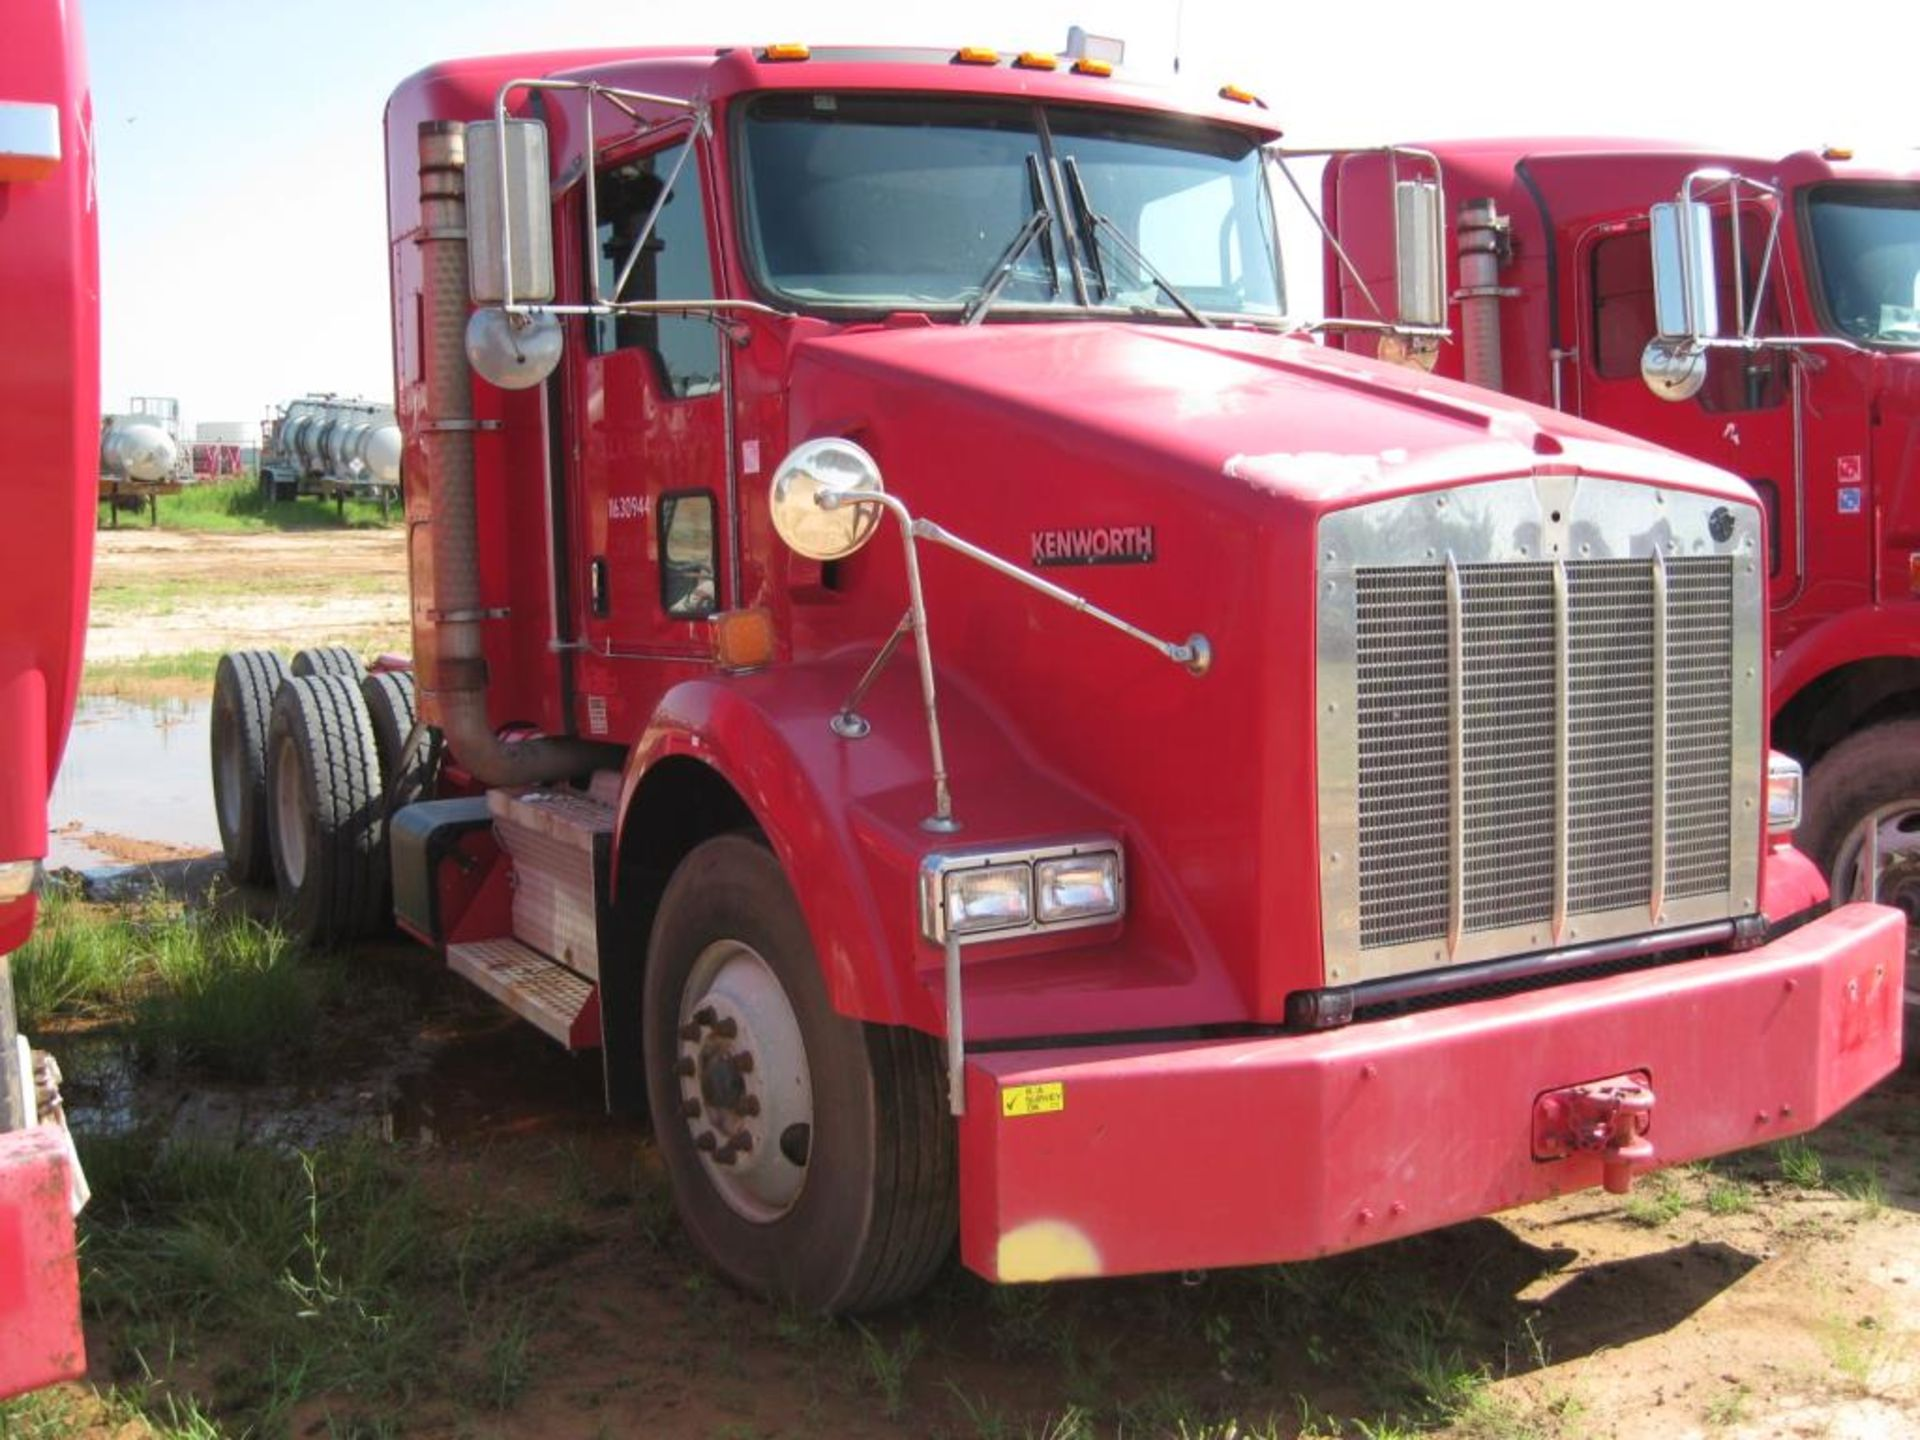 Kenworth Truck - Image 2 of 22